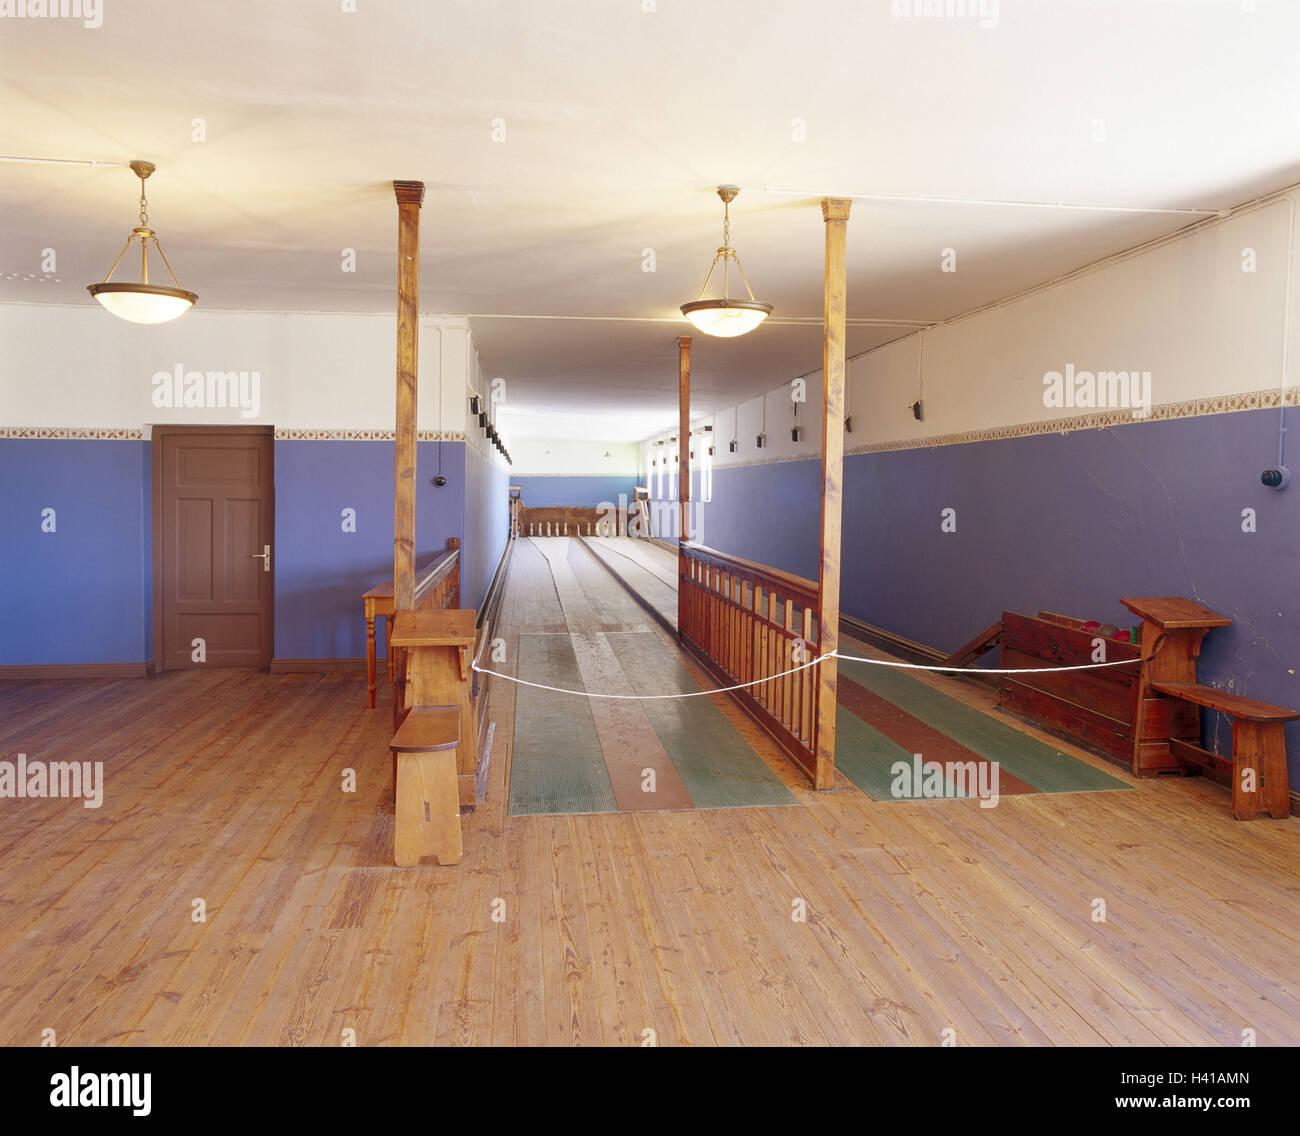 https://c8.alamy.com/compde/h41amn/namibia-luderitzbucht-kolmanskop-ghost-town-gebaude-kegelbahn-in-sud-west-afrika-stadt-kolmanskuppe-geisterhaus-interieur-kegel-ziel-ort-von-interesse-touristische-attraktion-h41amn.jpg